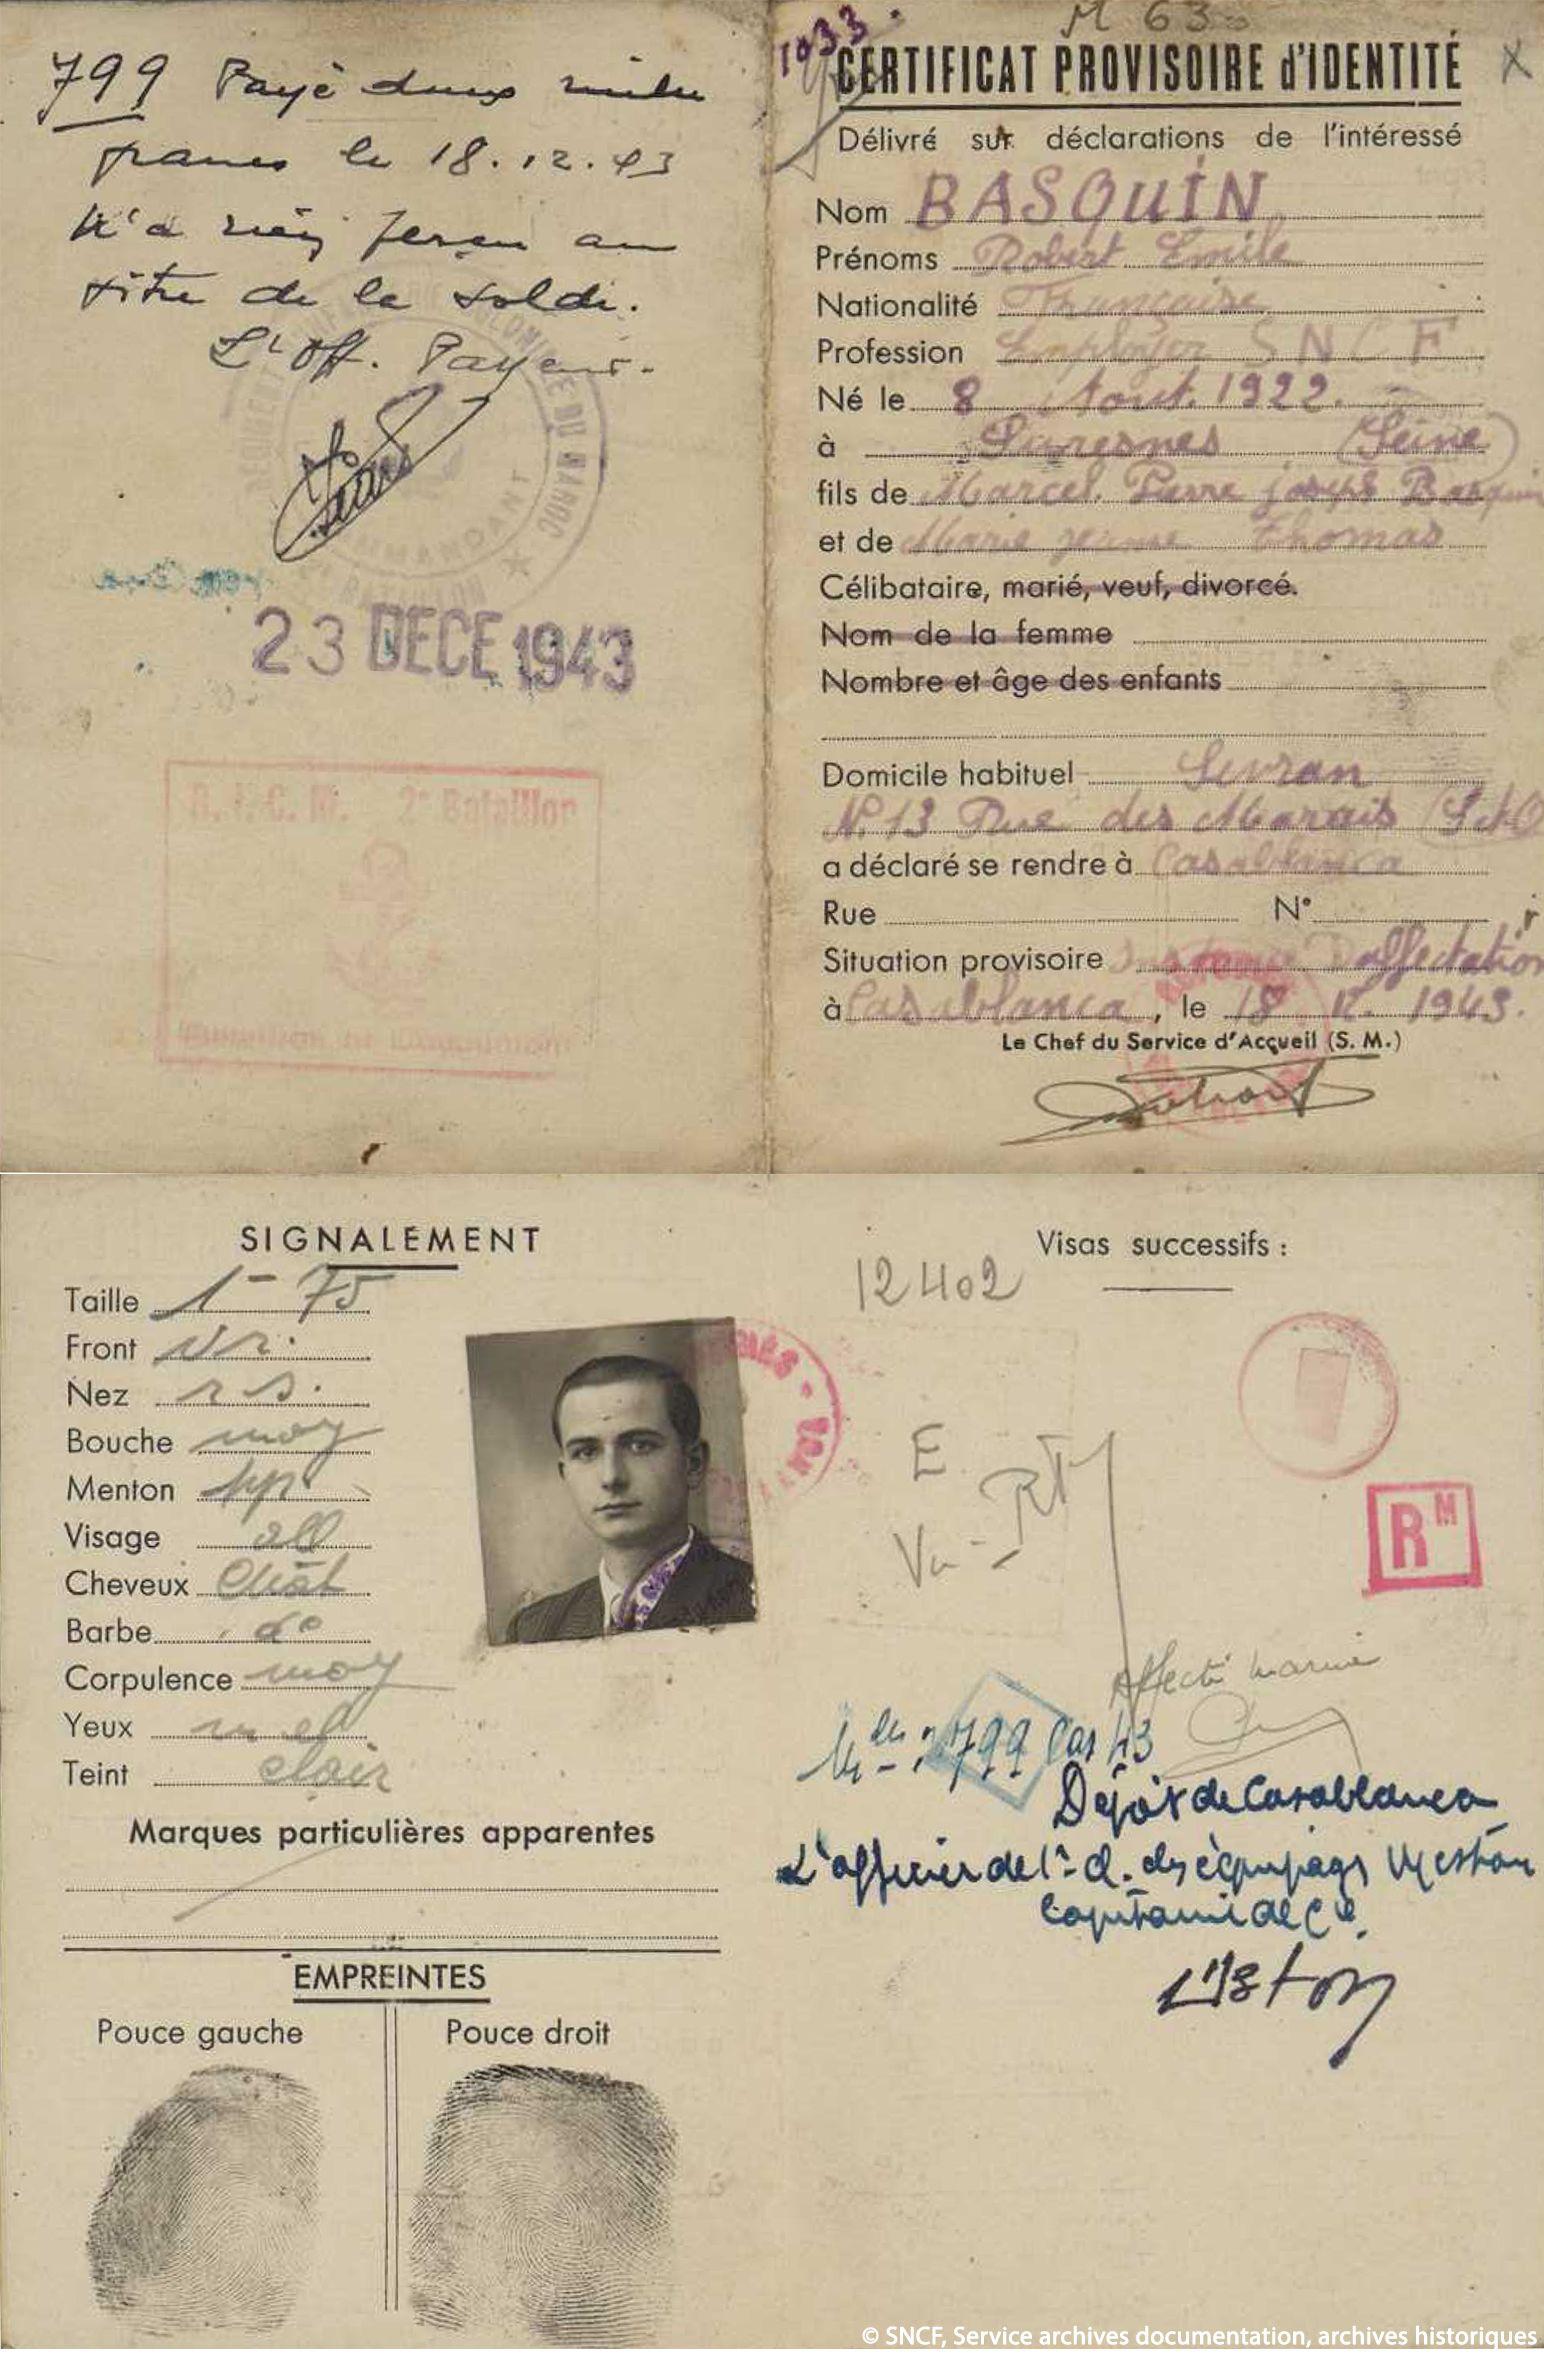 14 Certificat Provisoire D Identite Delivre A Casablanca Maroc